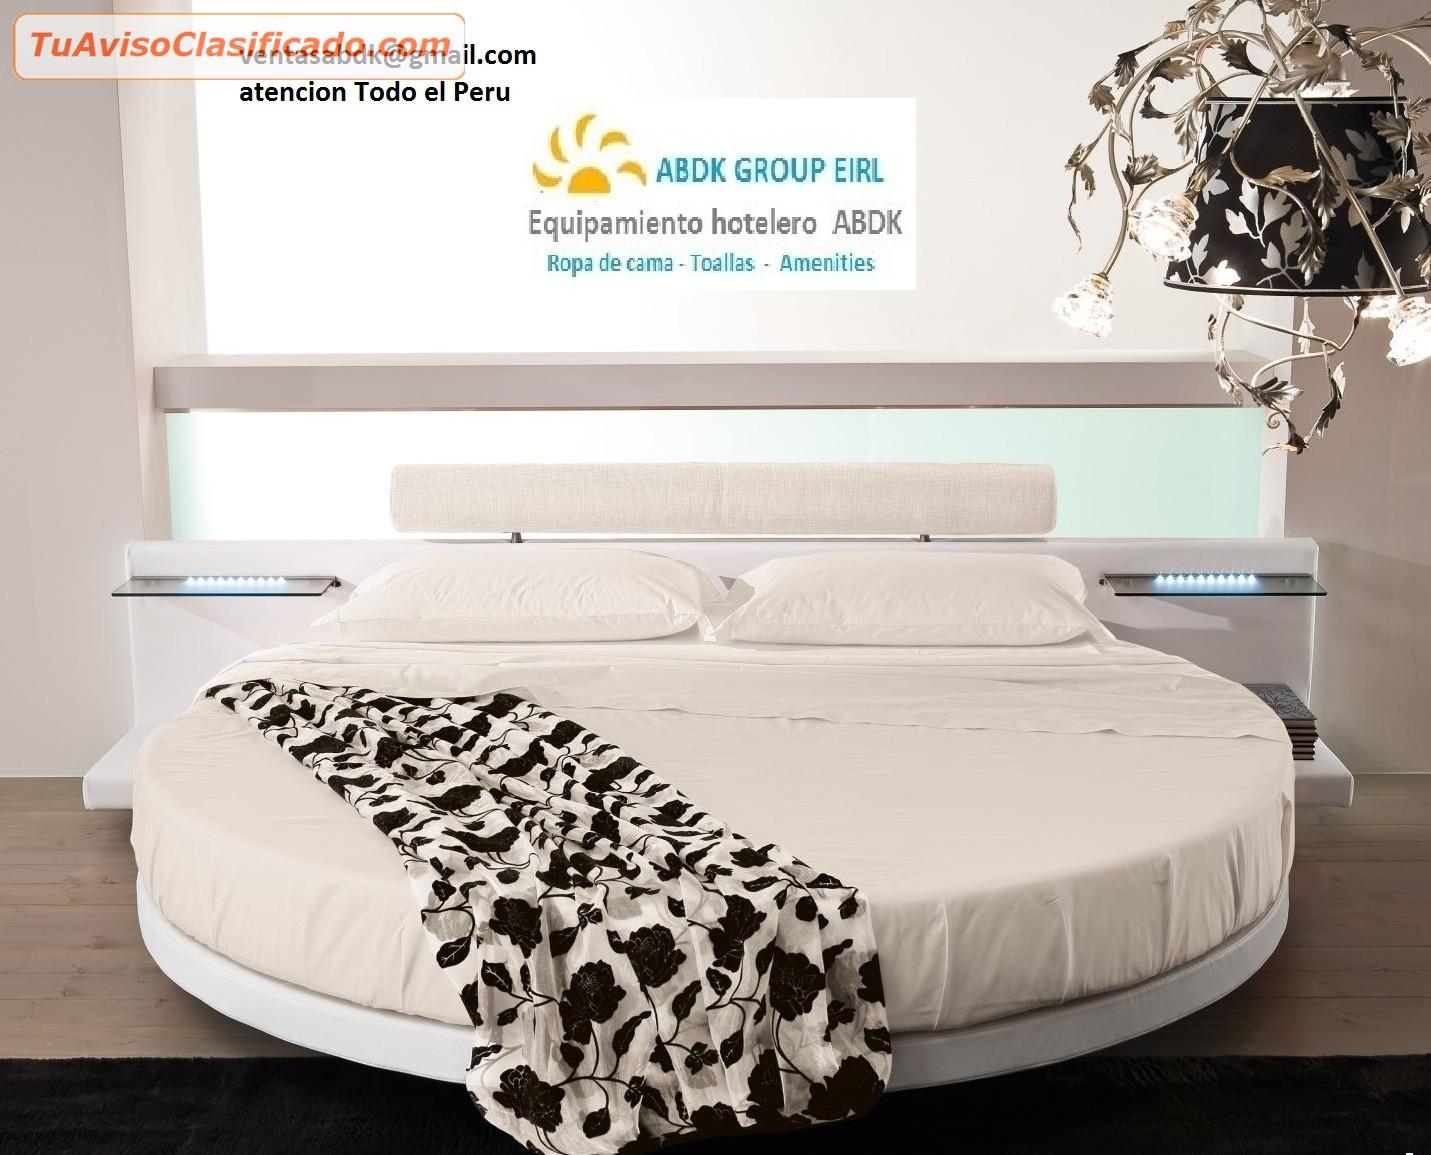 Batas de ba o batas para spa turbante vinchas batas de - Ropa de cama para hosteleria ...